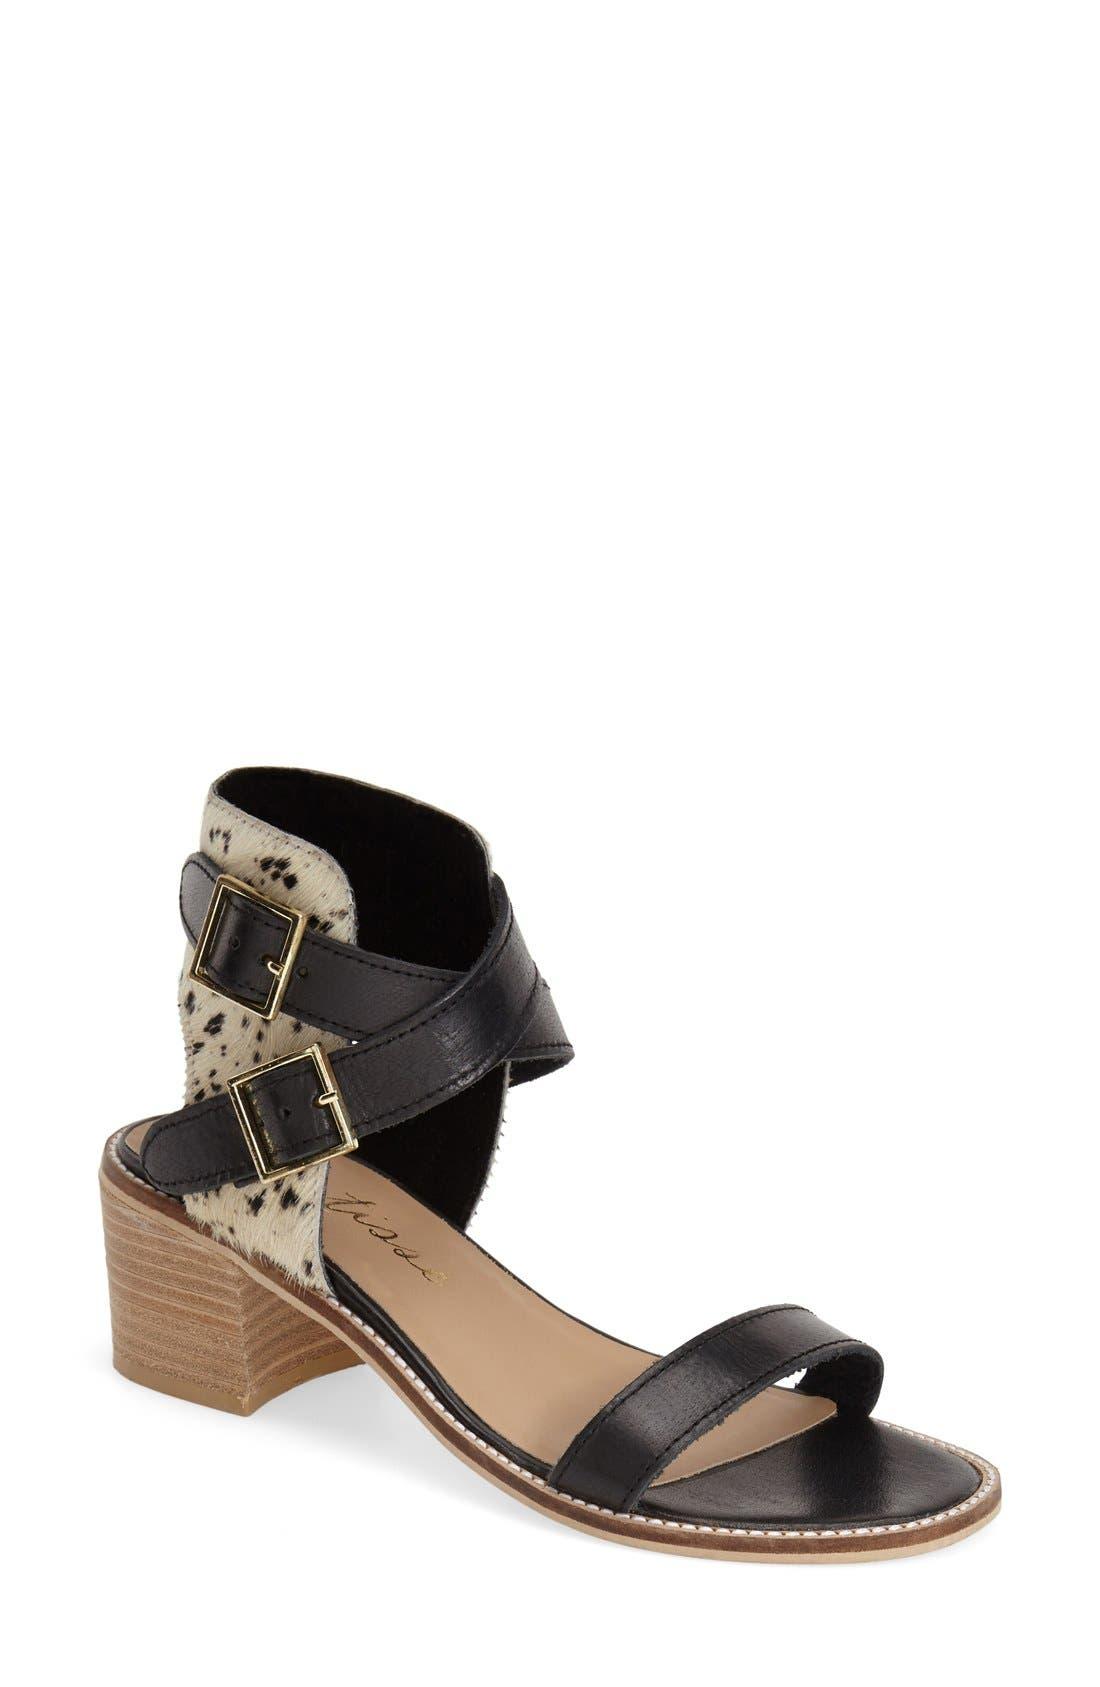 Alternate Image 1 Selected - Matisse 'Orin' Sandal (Women)